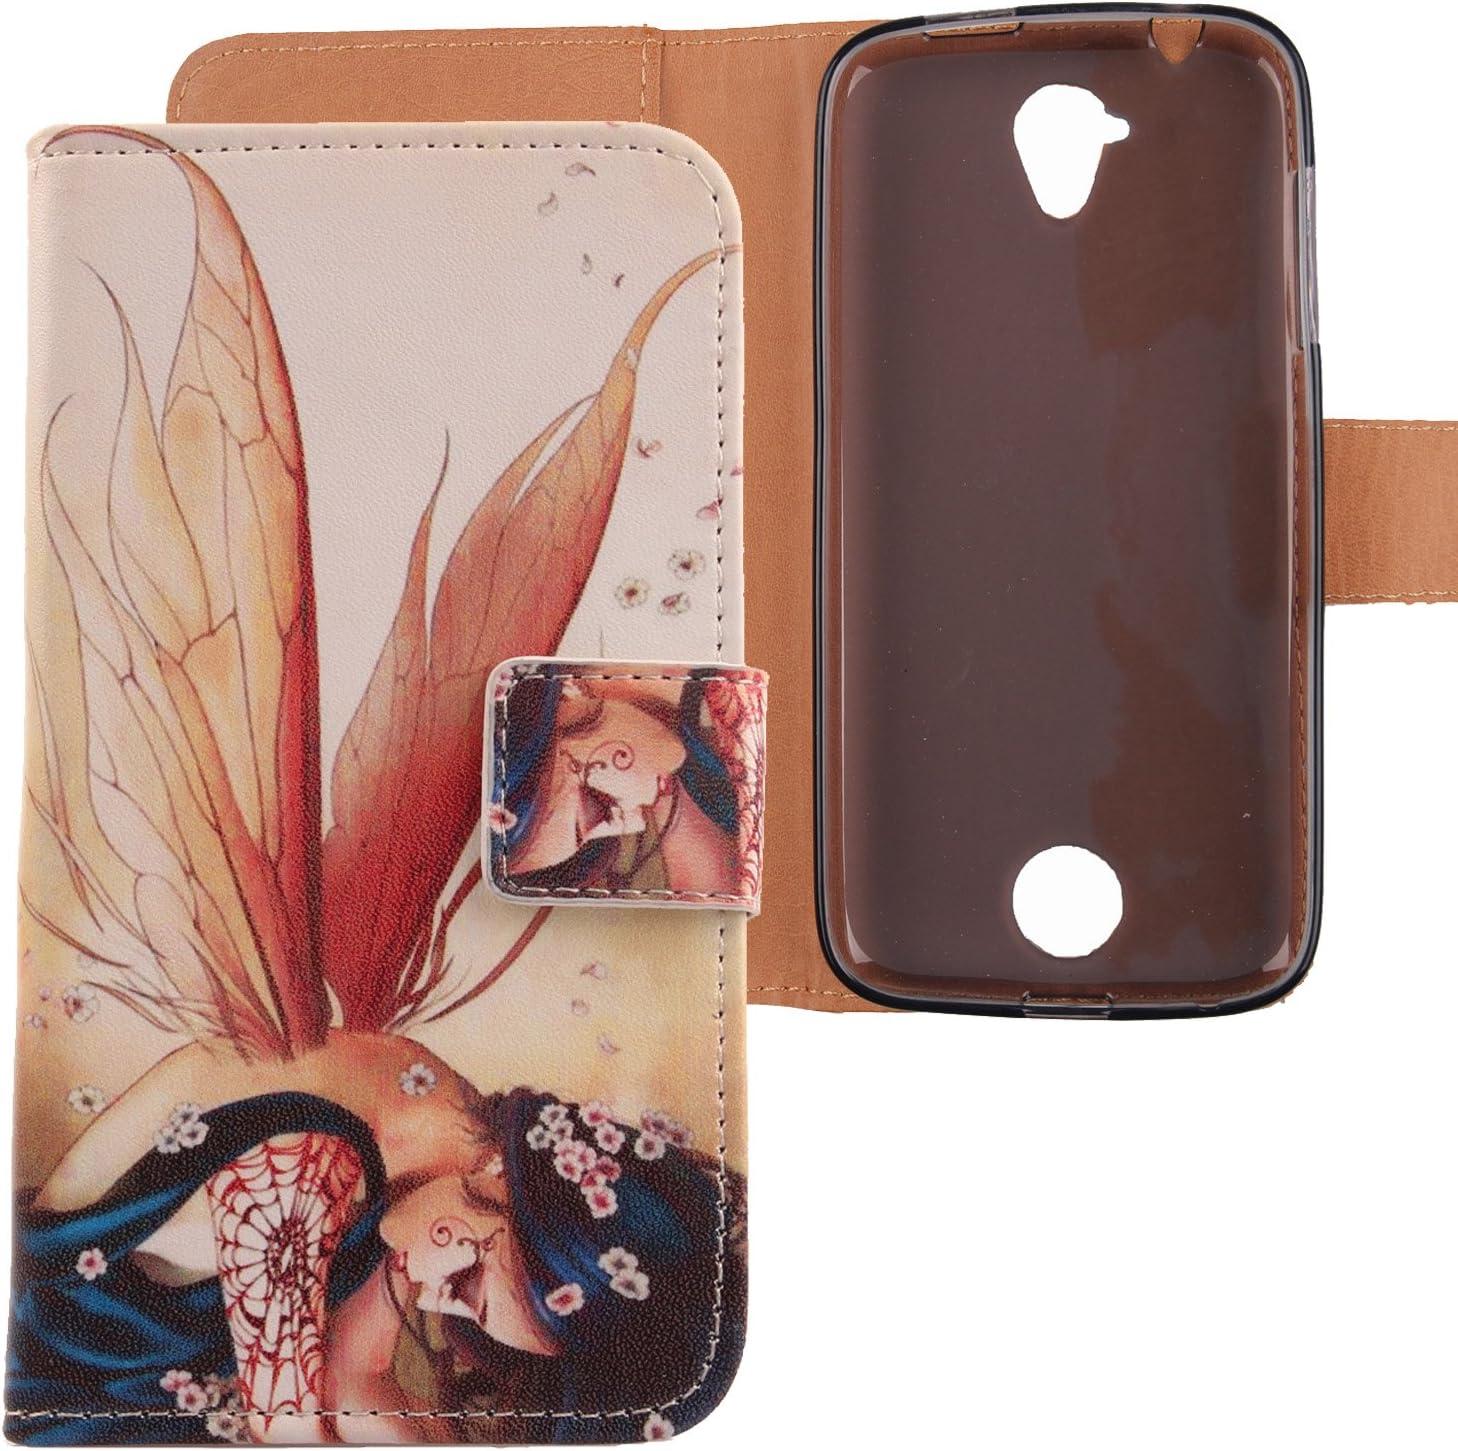 Lankashi Pattern Design PU Flip Leather Cover Skin Protective Case for 4.5